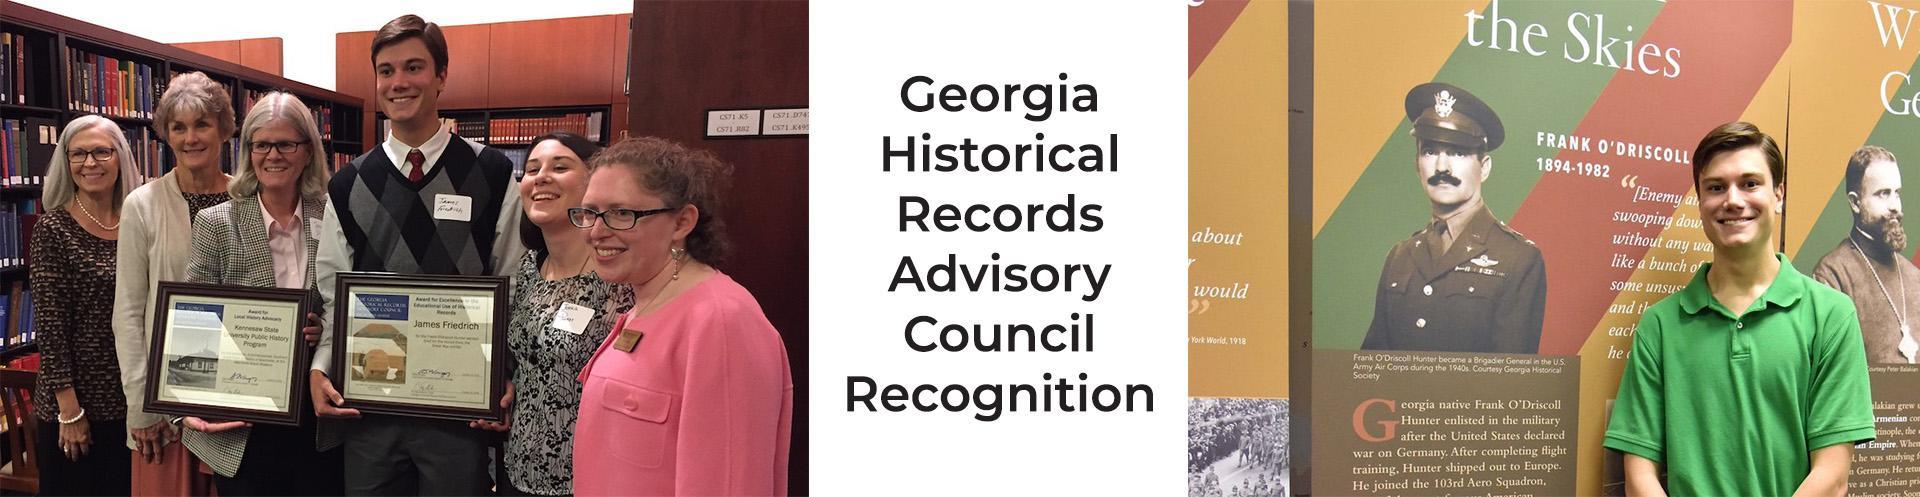 KSU history program recognized